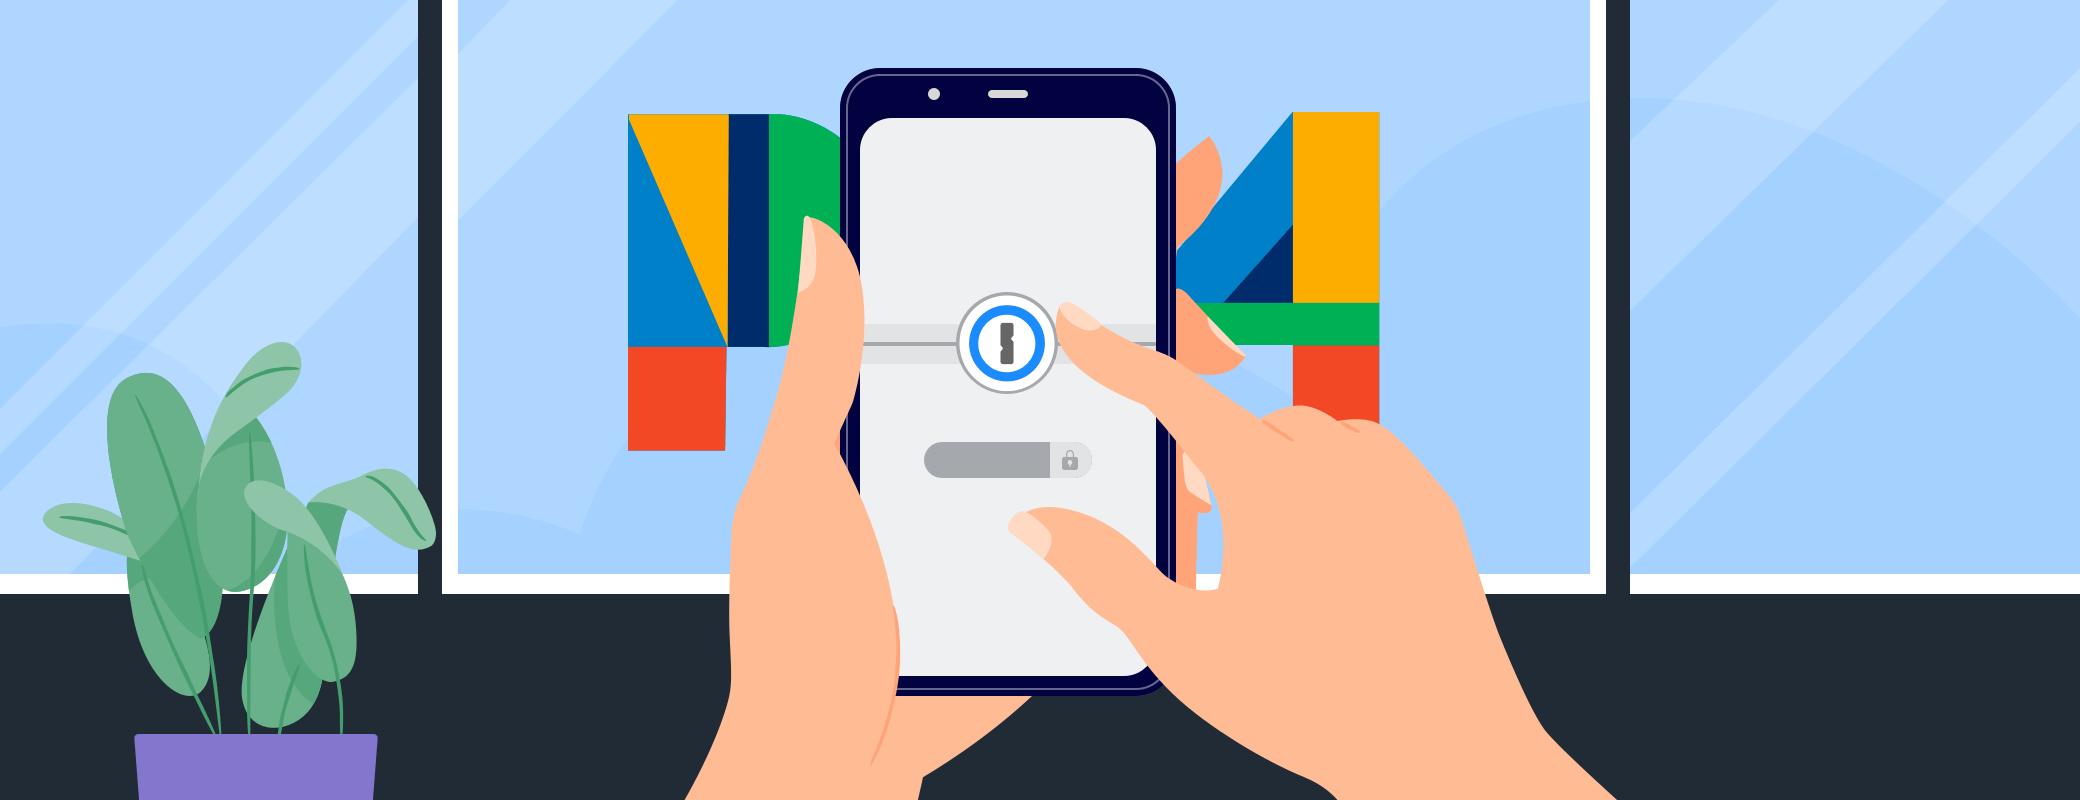 1Password + Pixel 4 + Android 10 = ❤️🔐